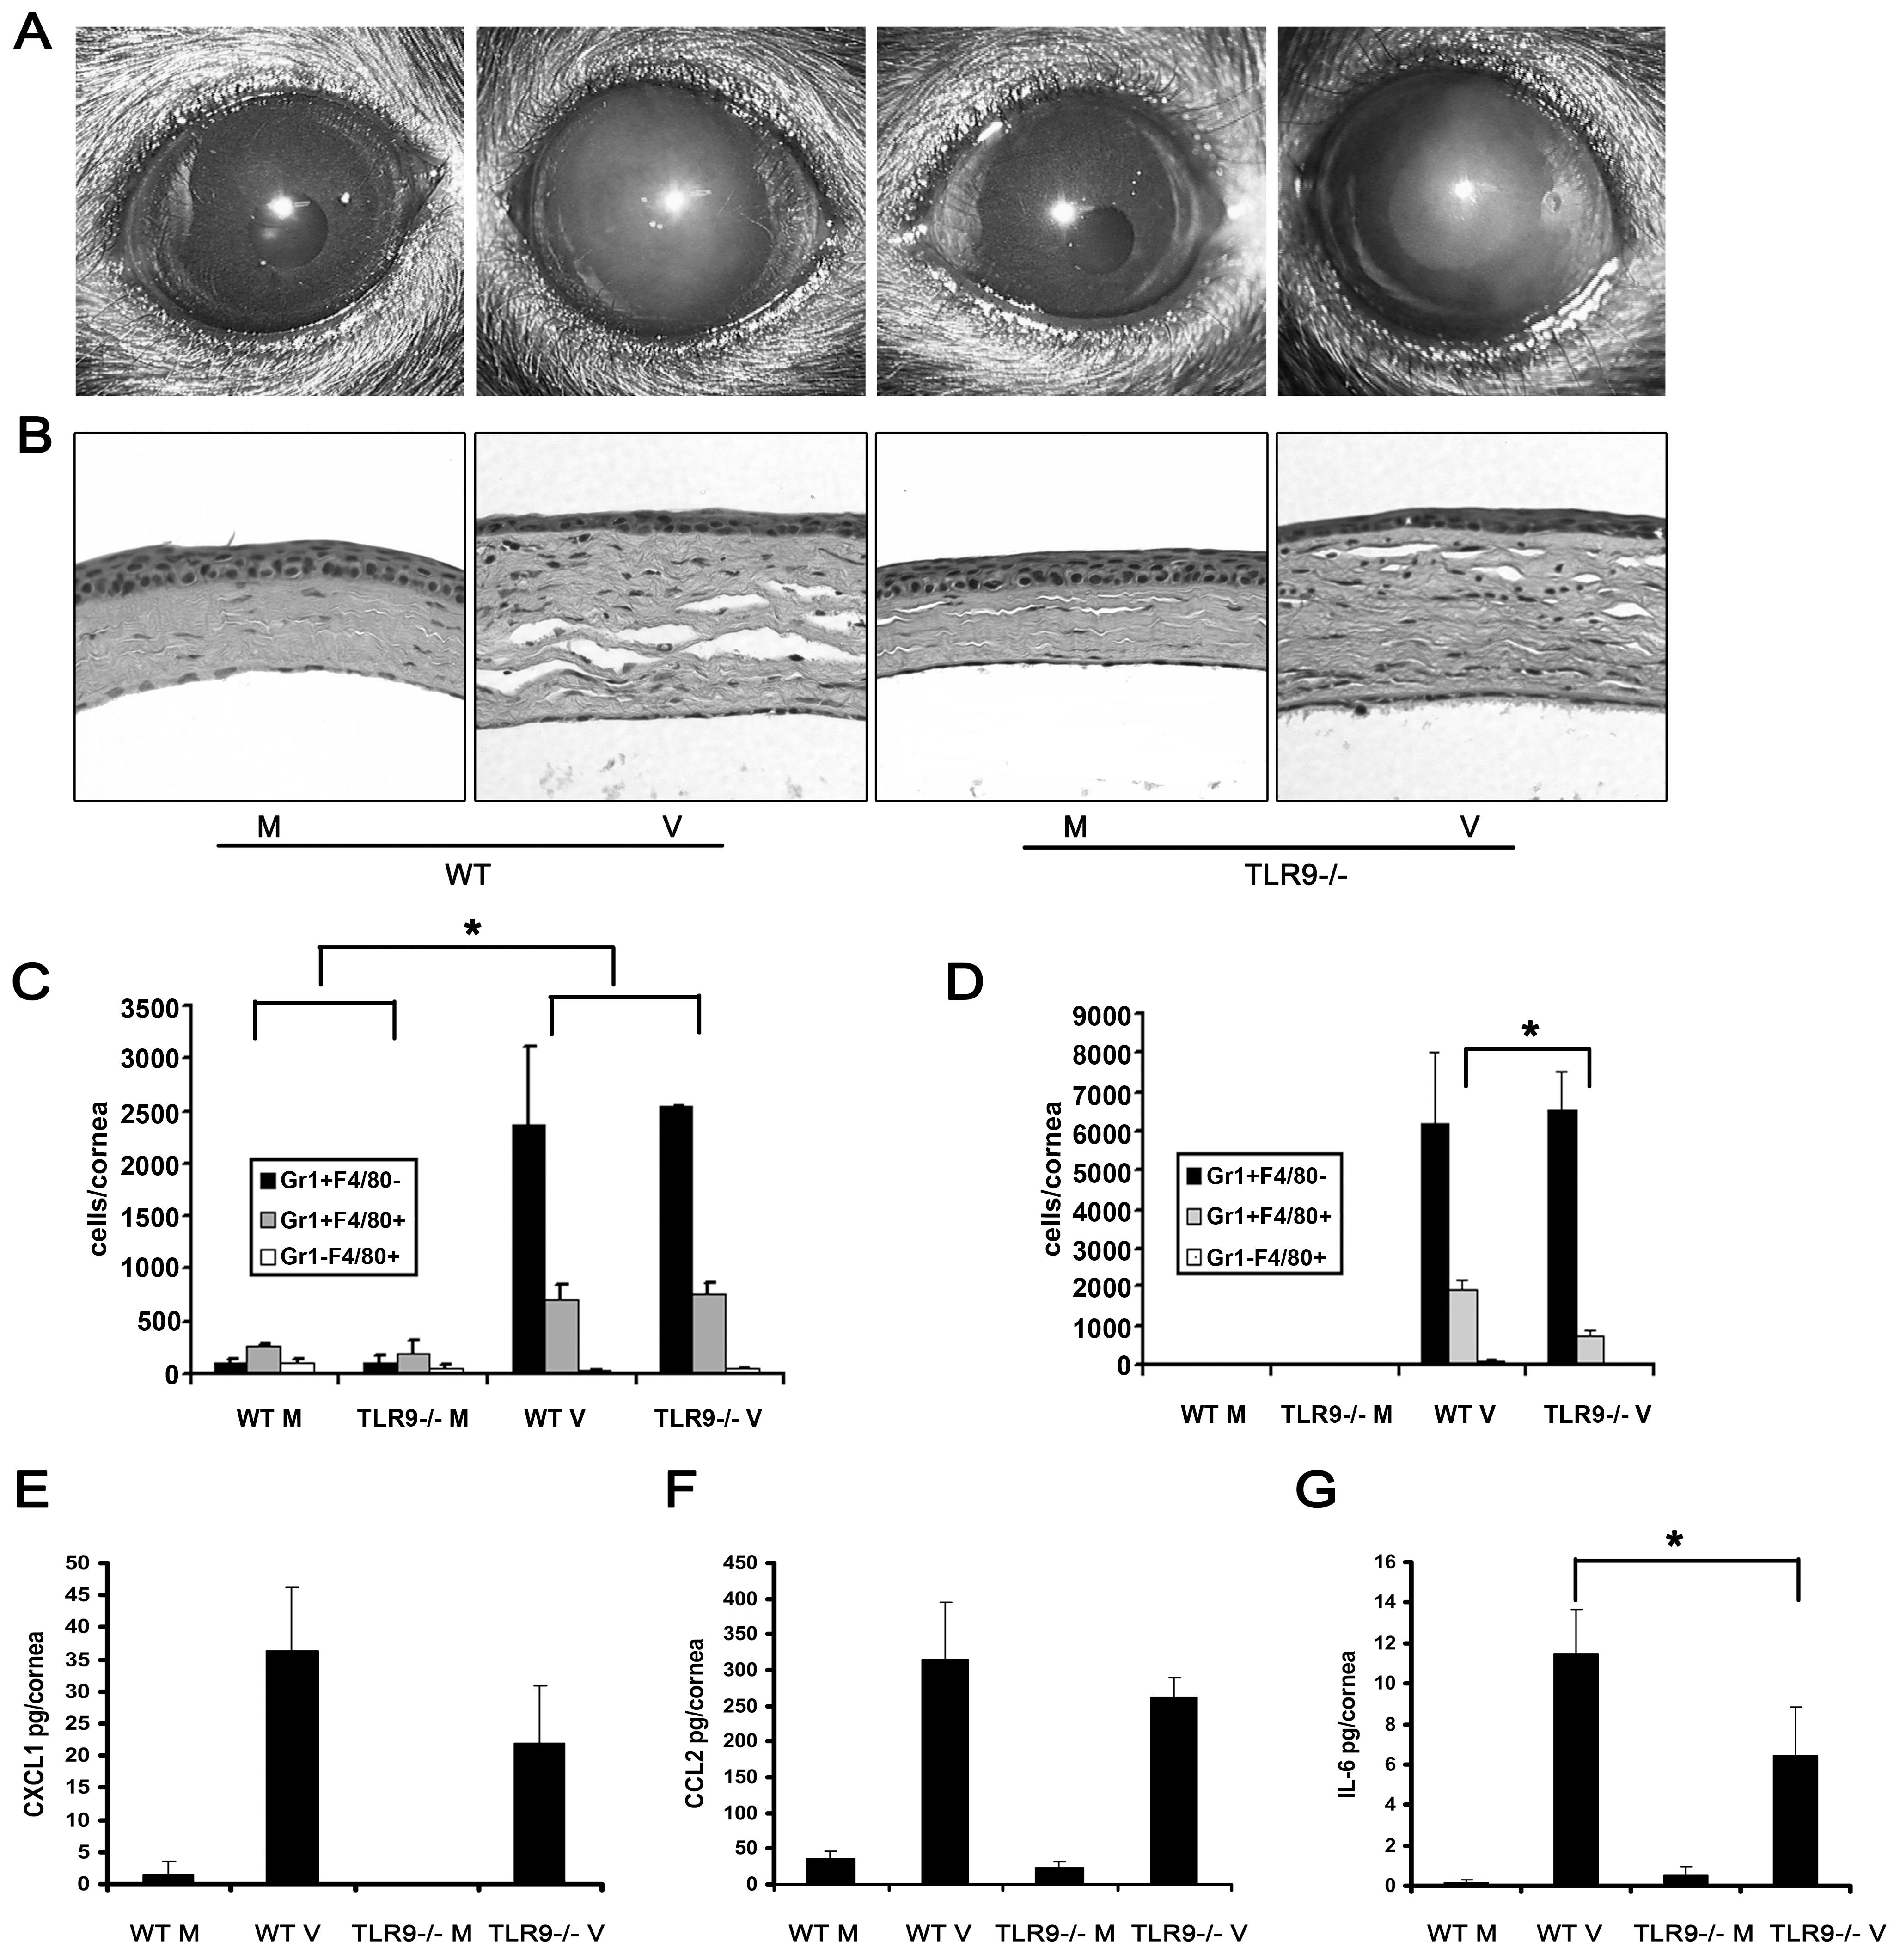 Tlr9 is not essential for the development of adenovirus keratitis.